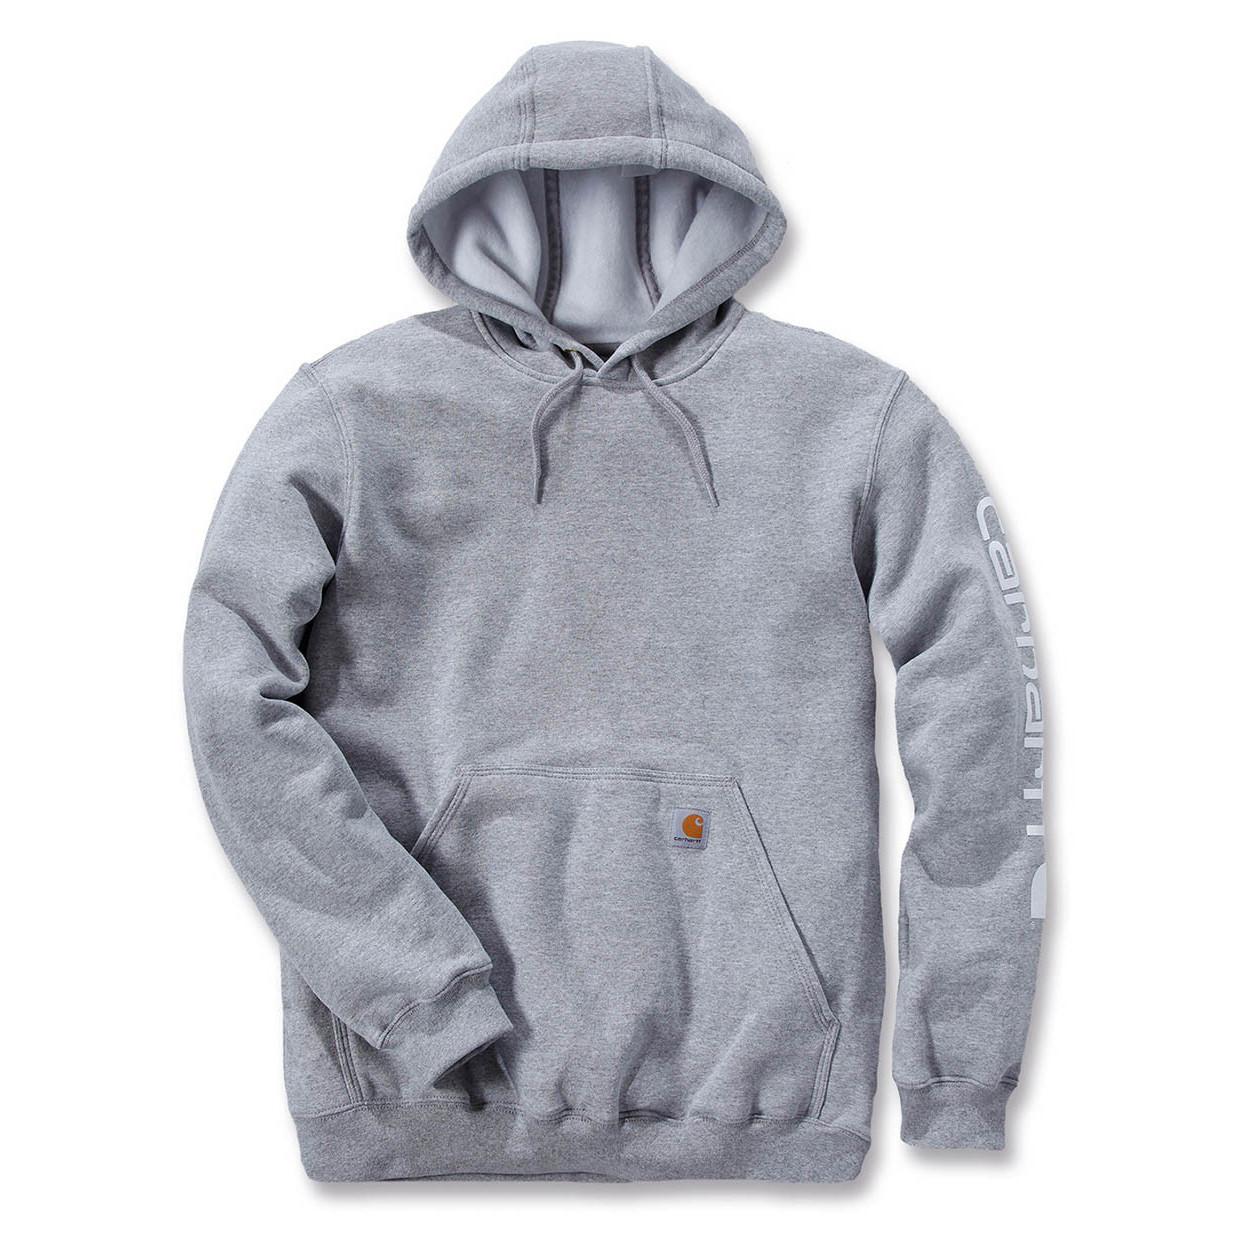 Худи Carhartt Sleeve Logo Hooded Sweatshirt - K288 (Heather Grey, L)